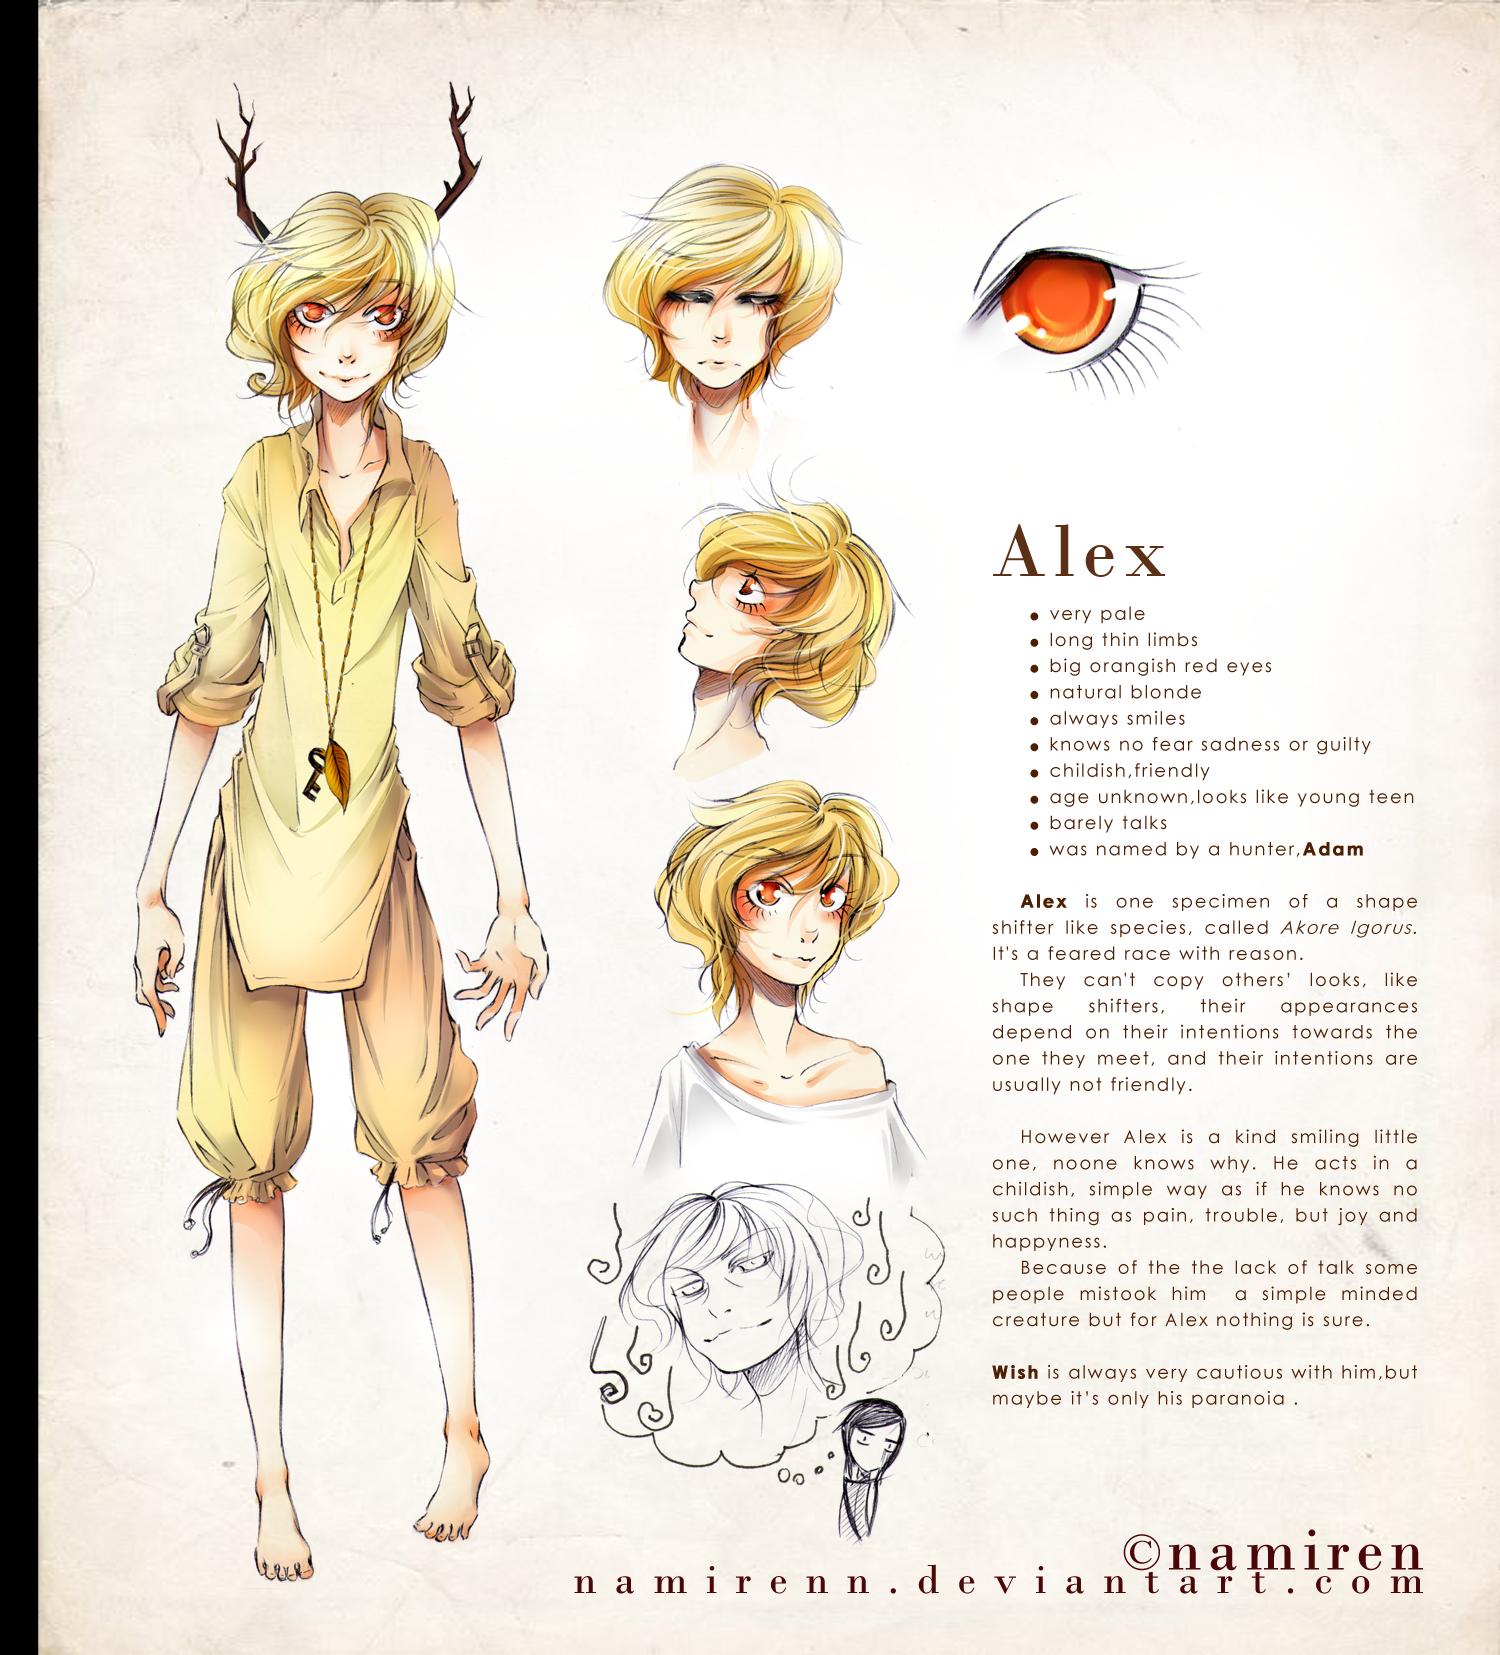 Alex - character sheet by namirenn